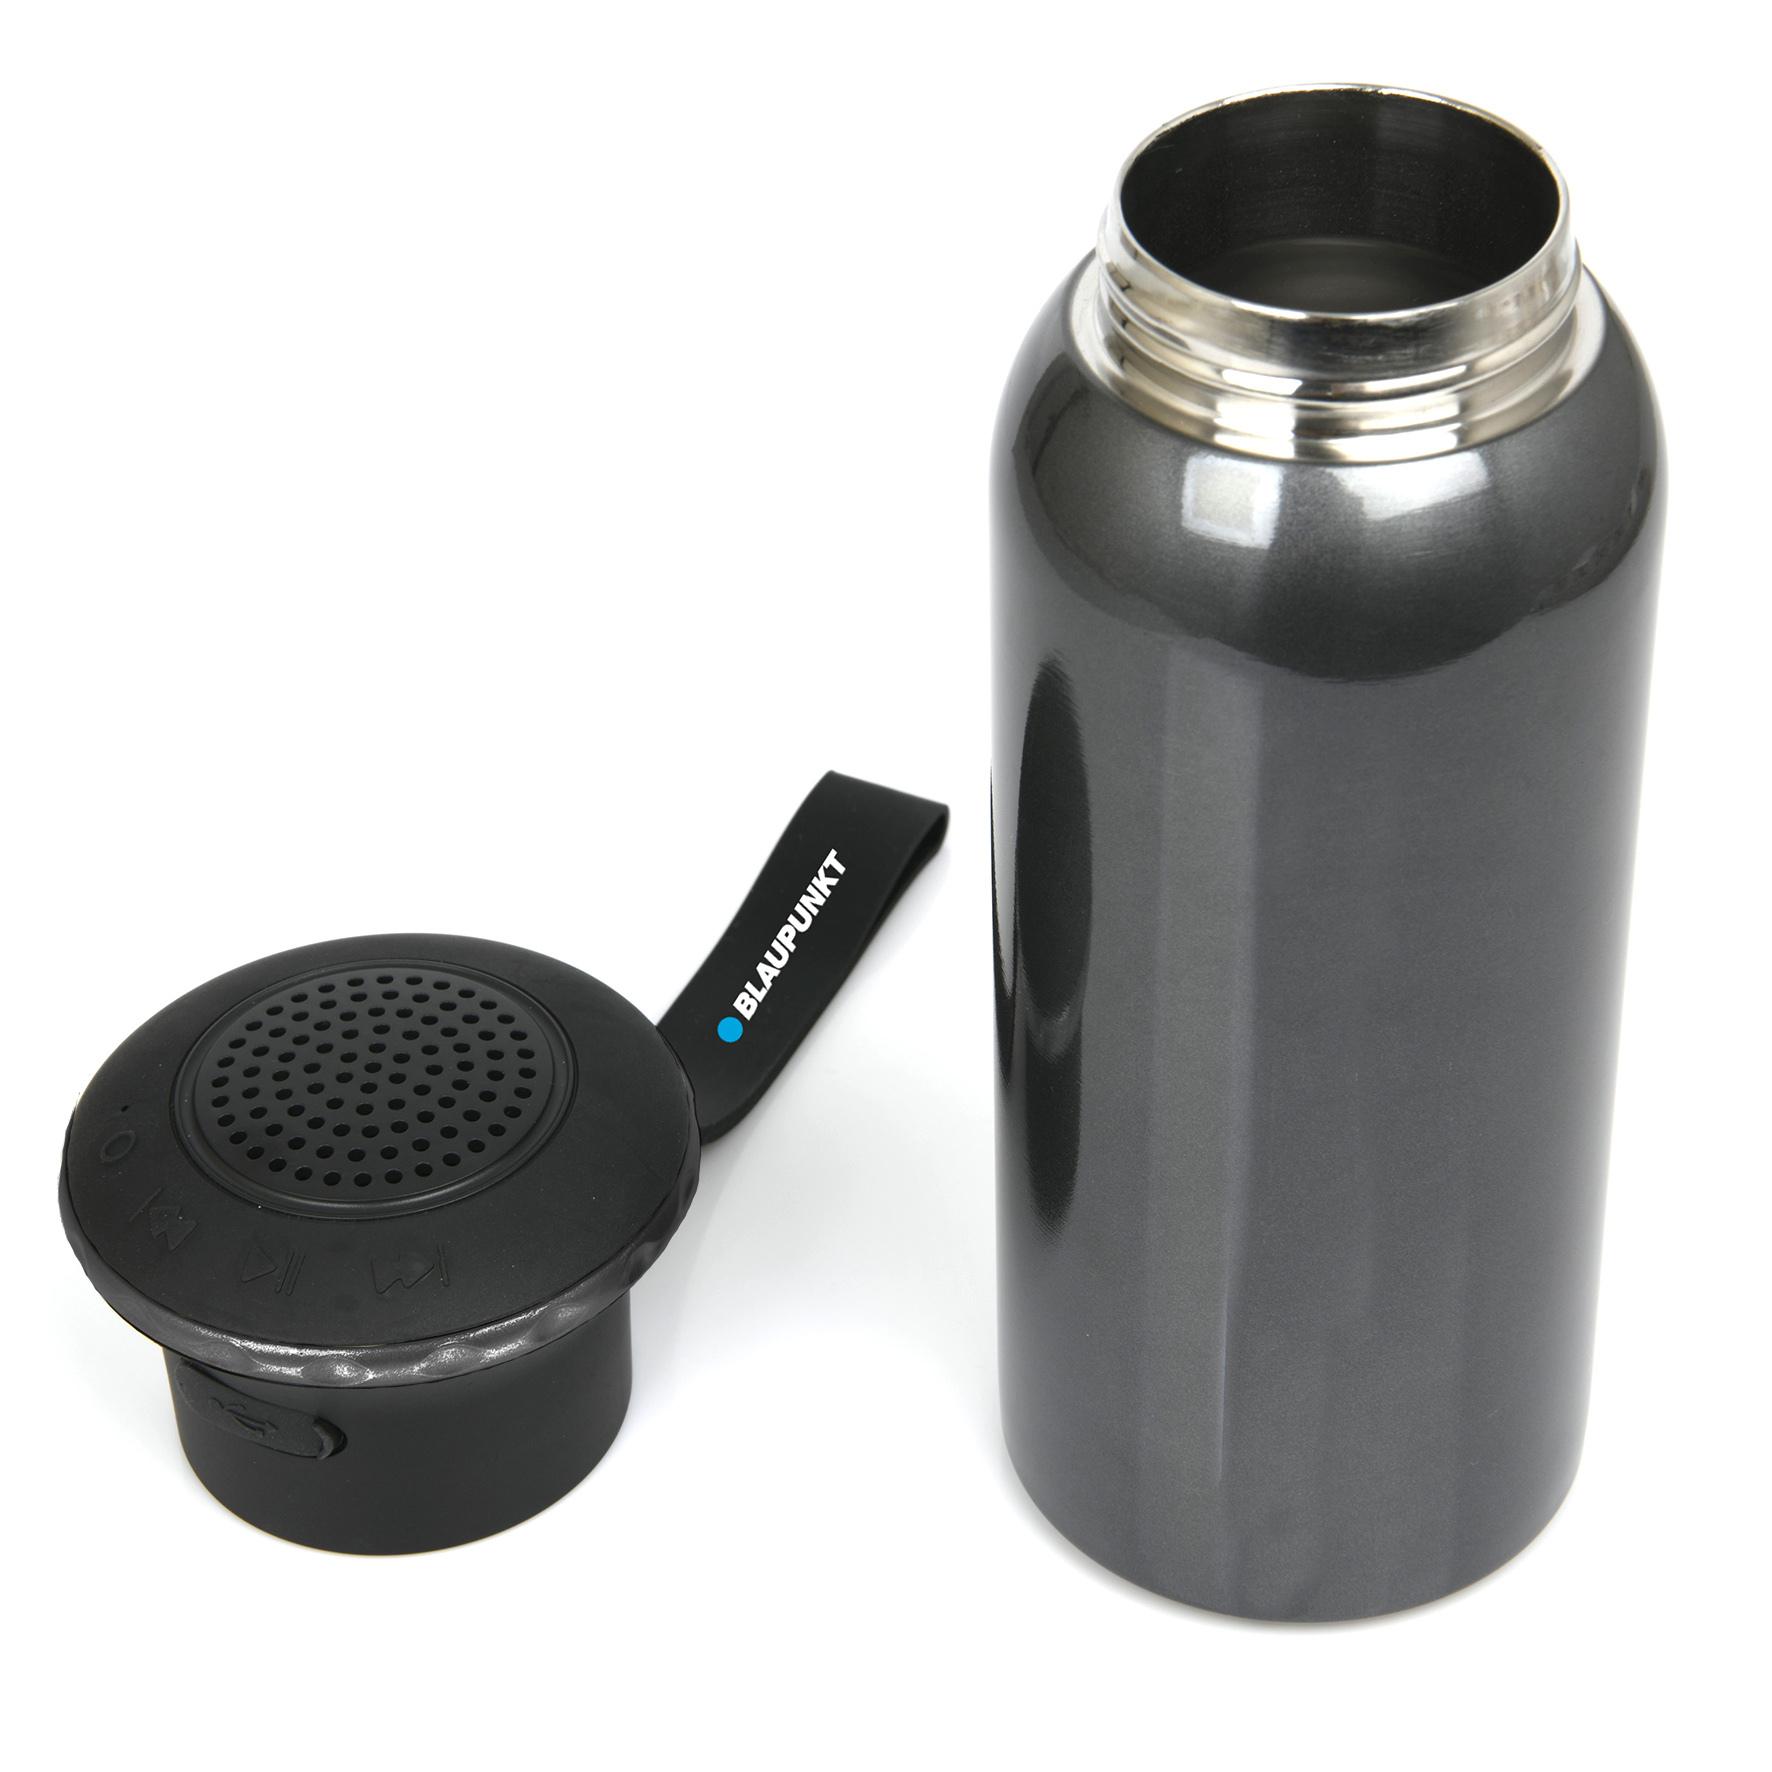 Enceinte bouteille isotherme en acier inoxydable - 12-1230-1